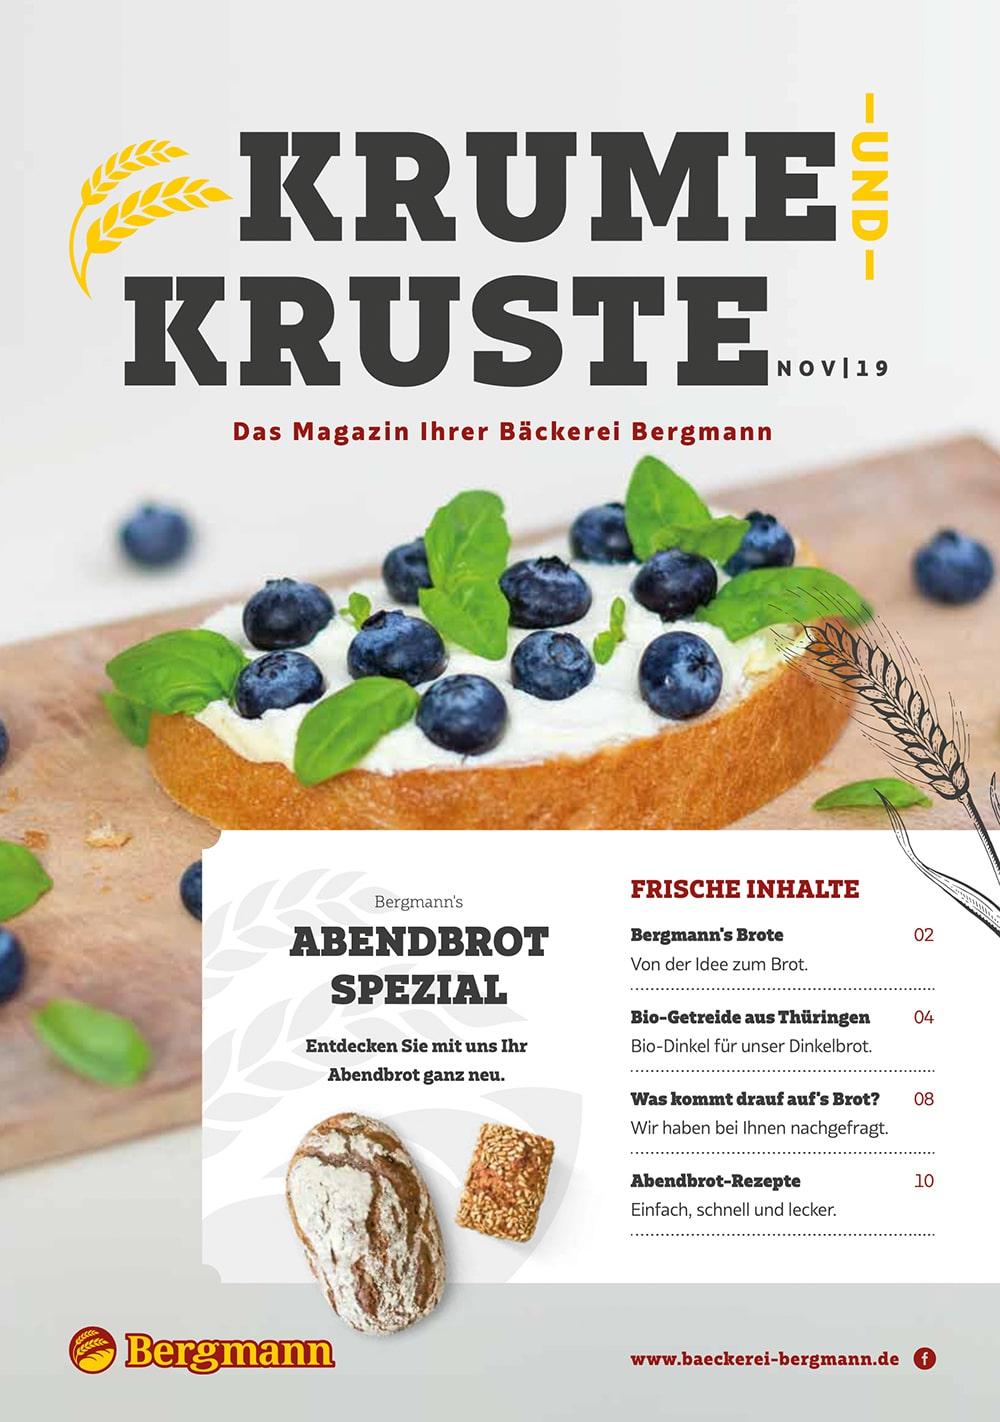 Krume & Kruste - November 2019